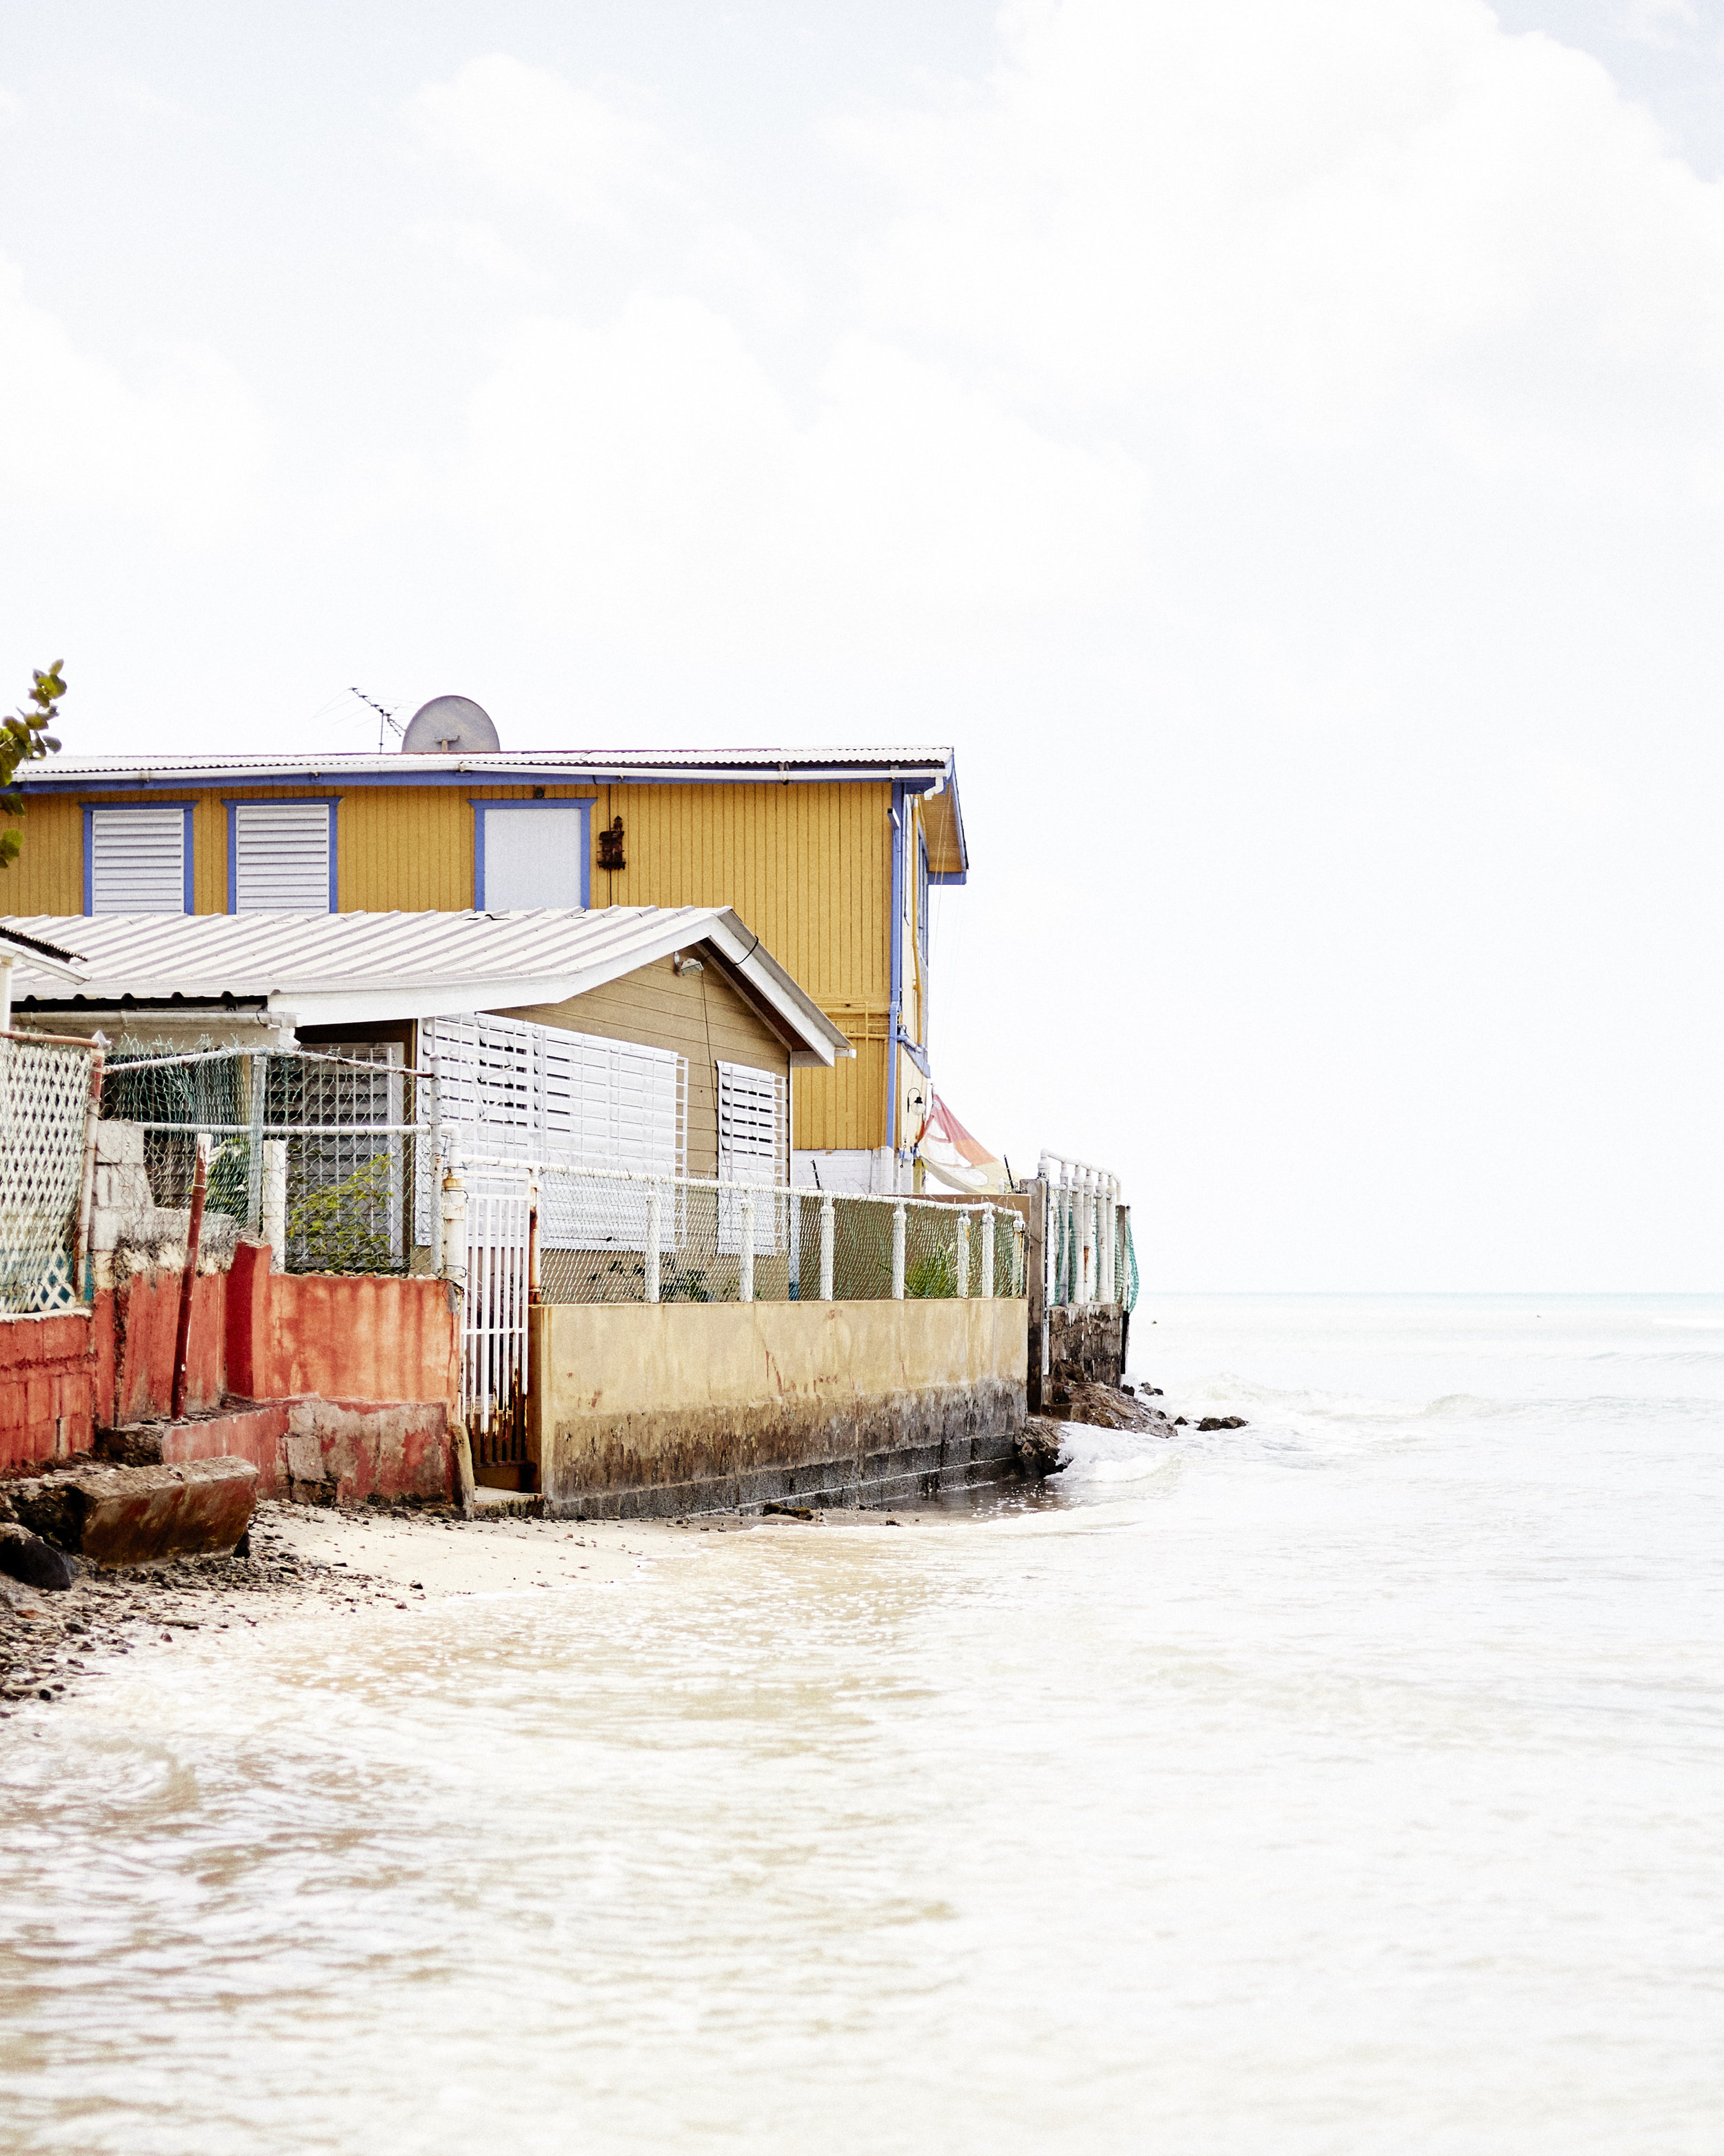 Puerto_Rico_584.jpg